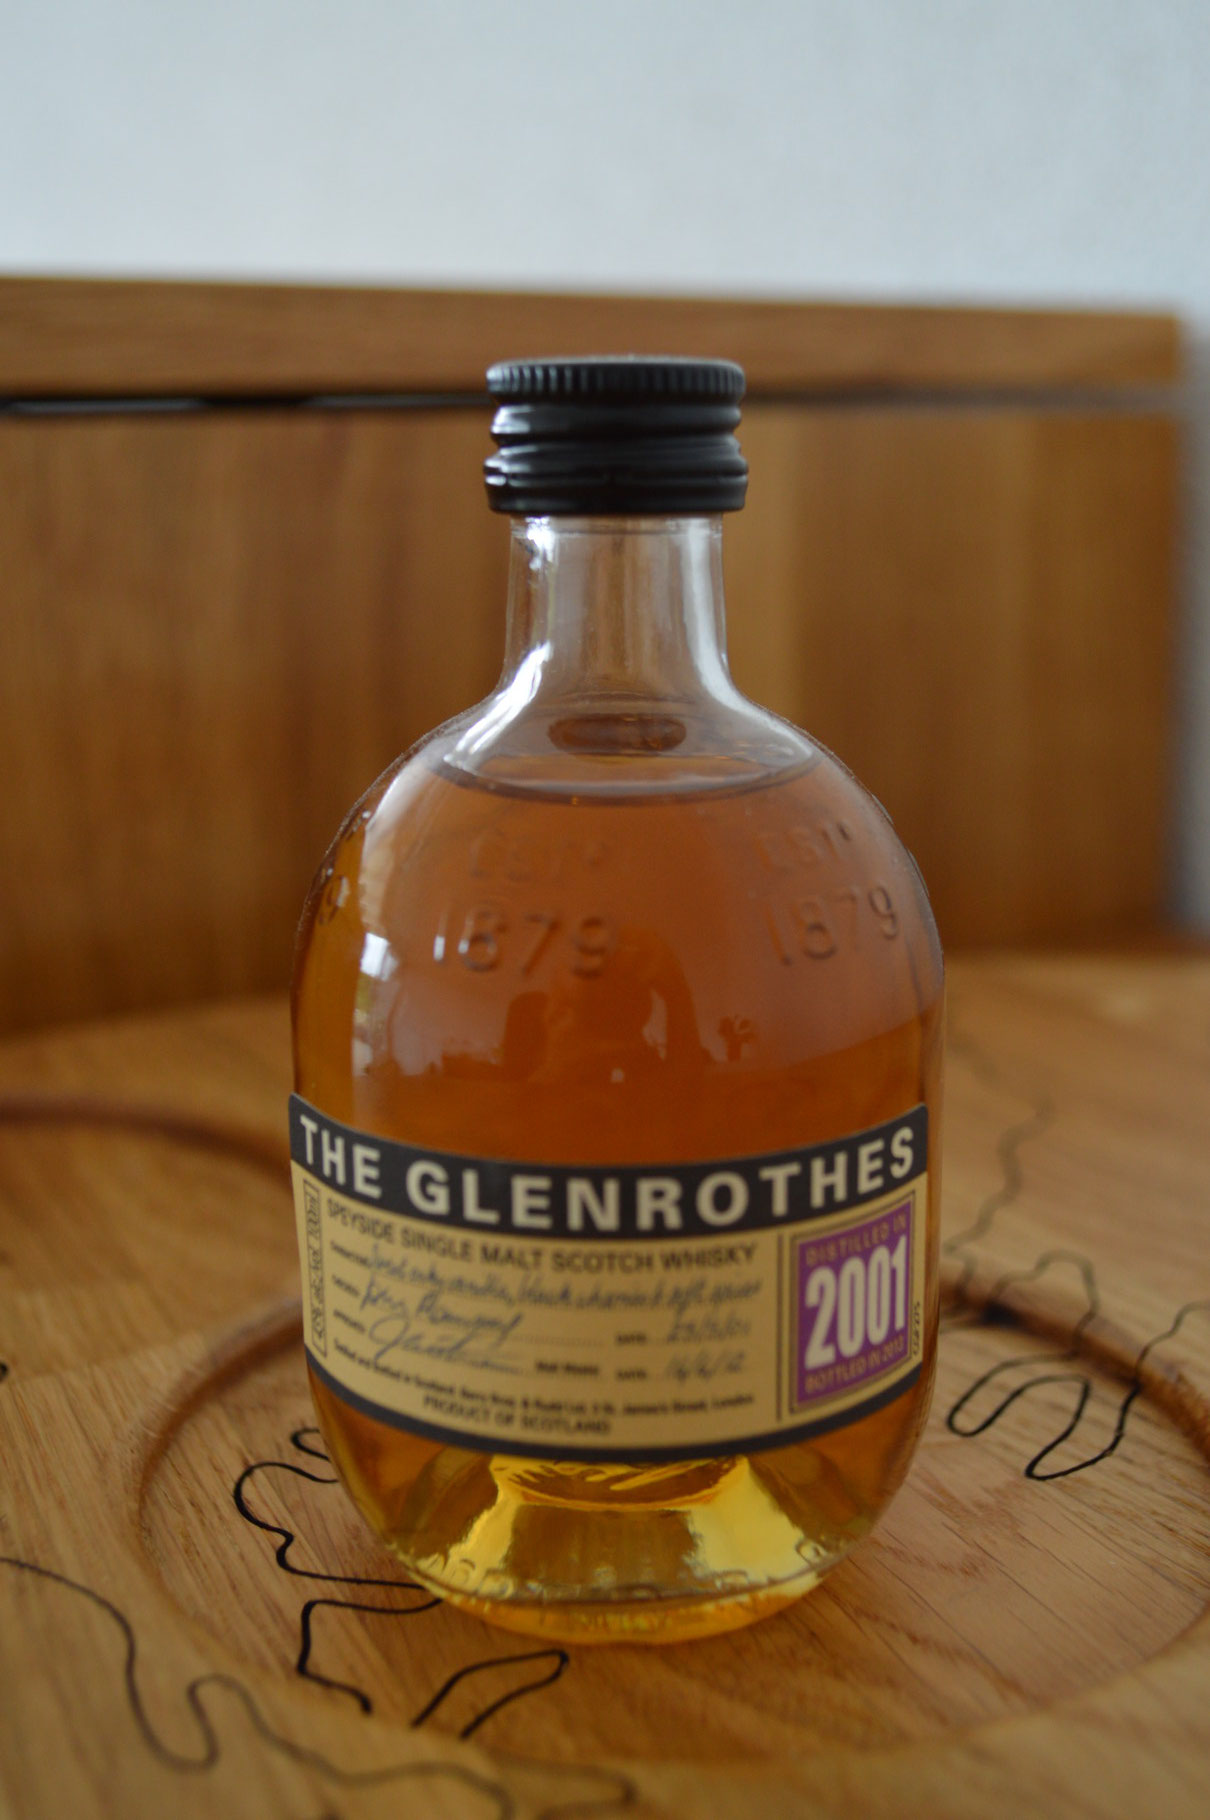 SPEYSIDE - The Glenrothes